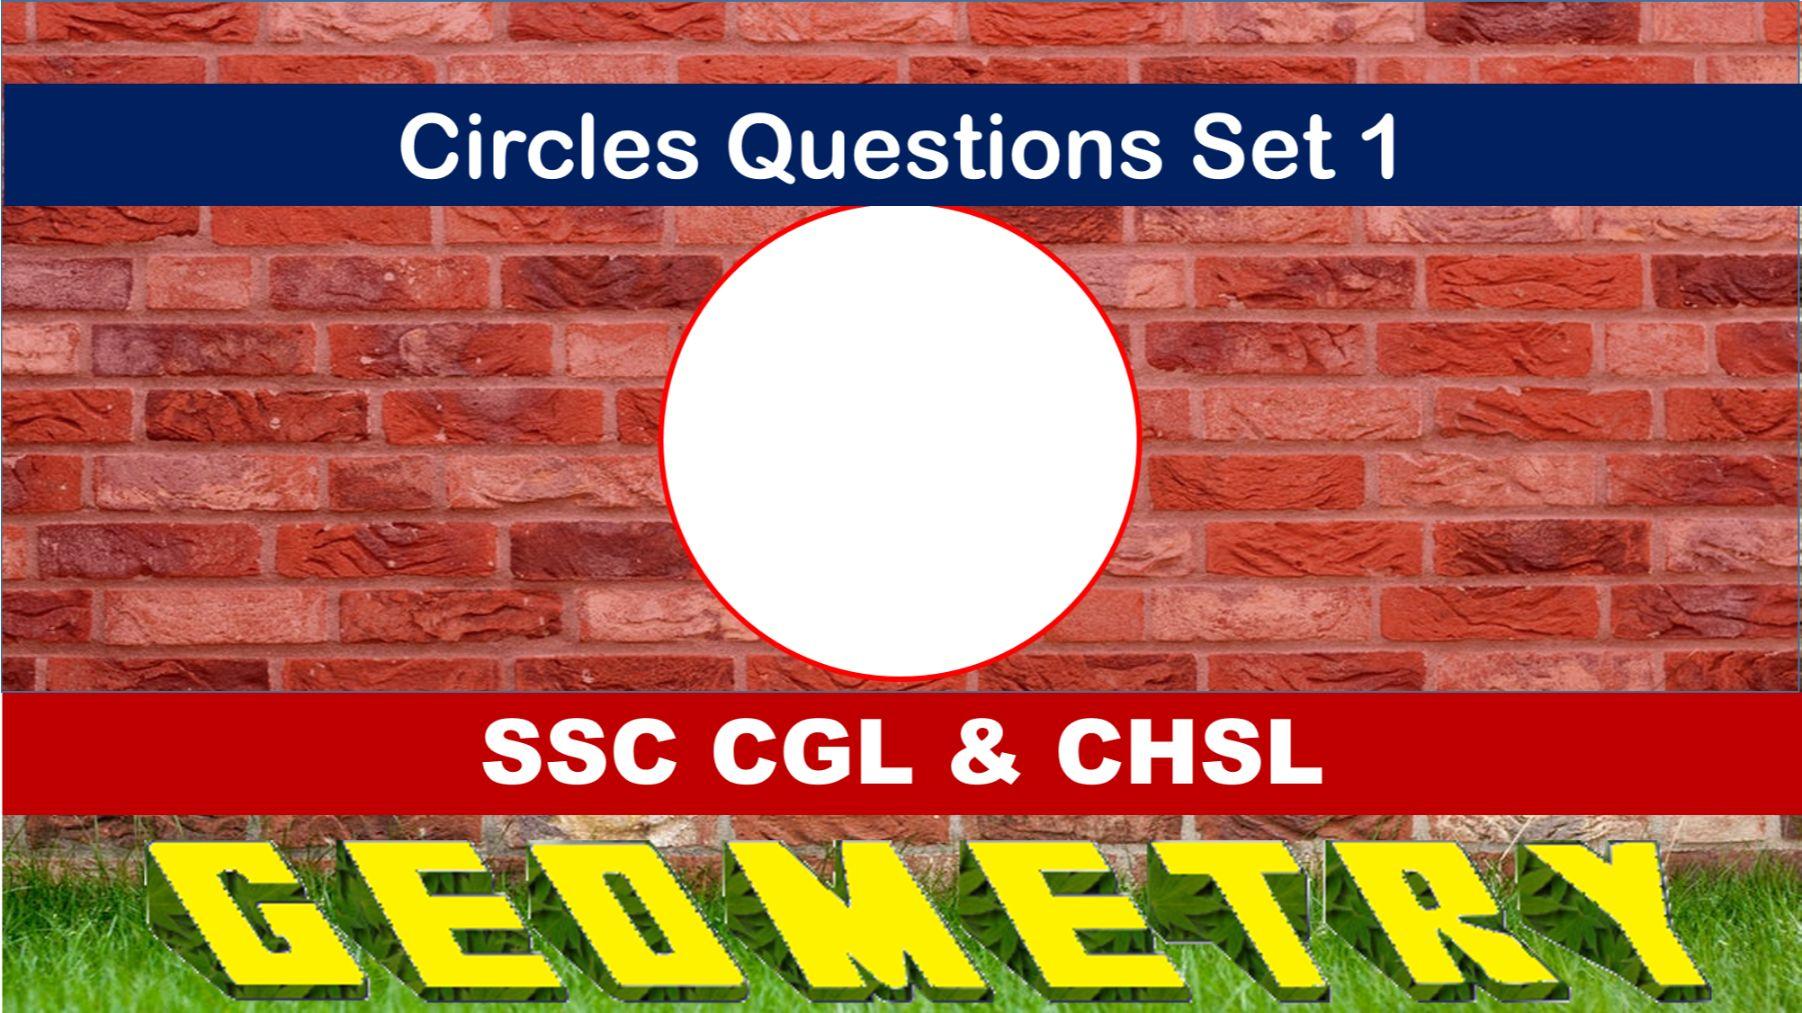 SSC CGL Geometry Circles Set 1